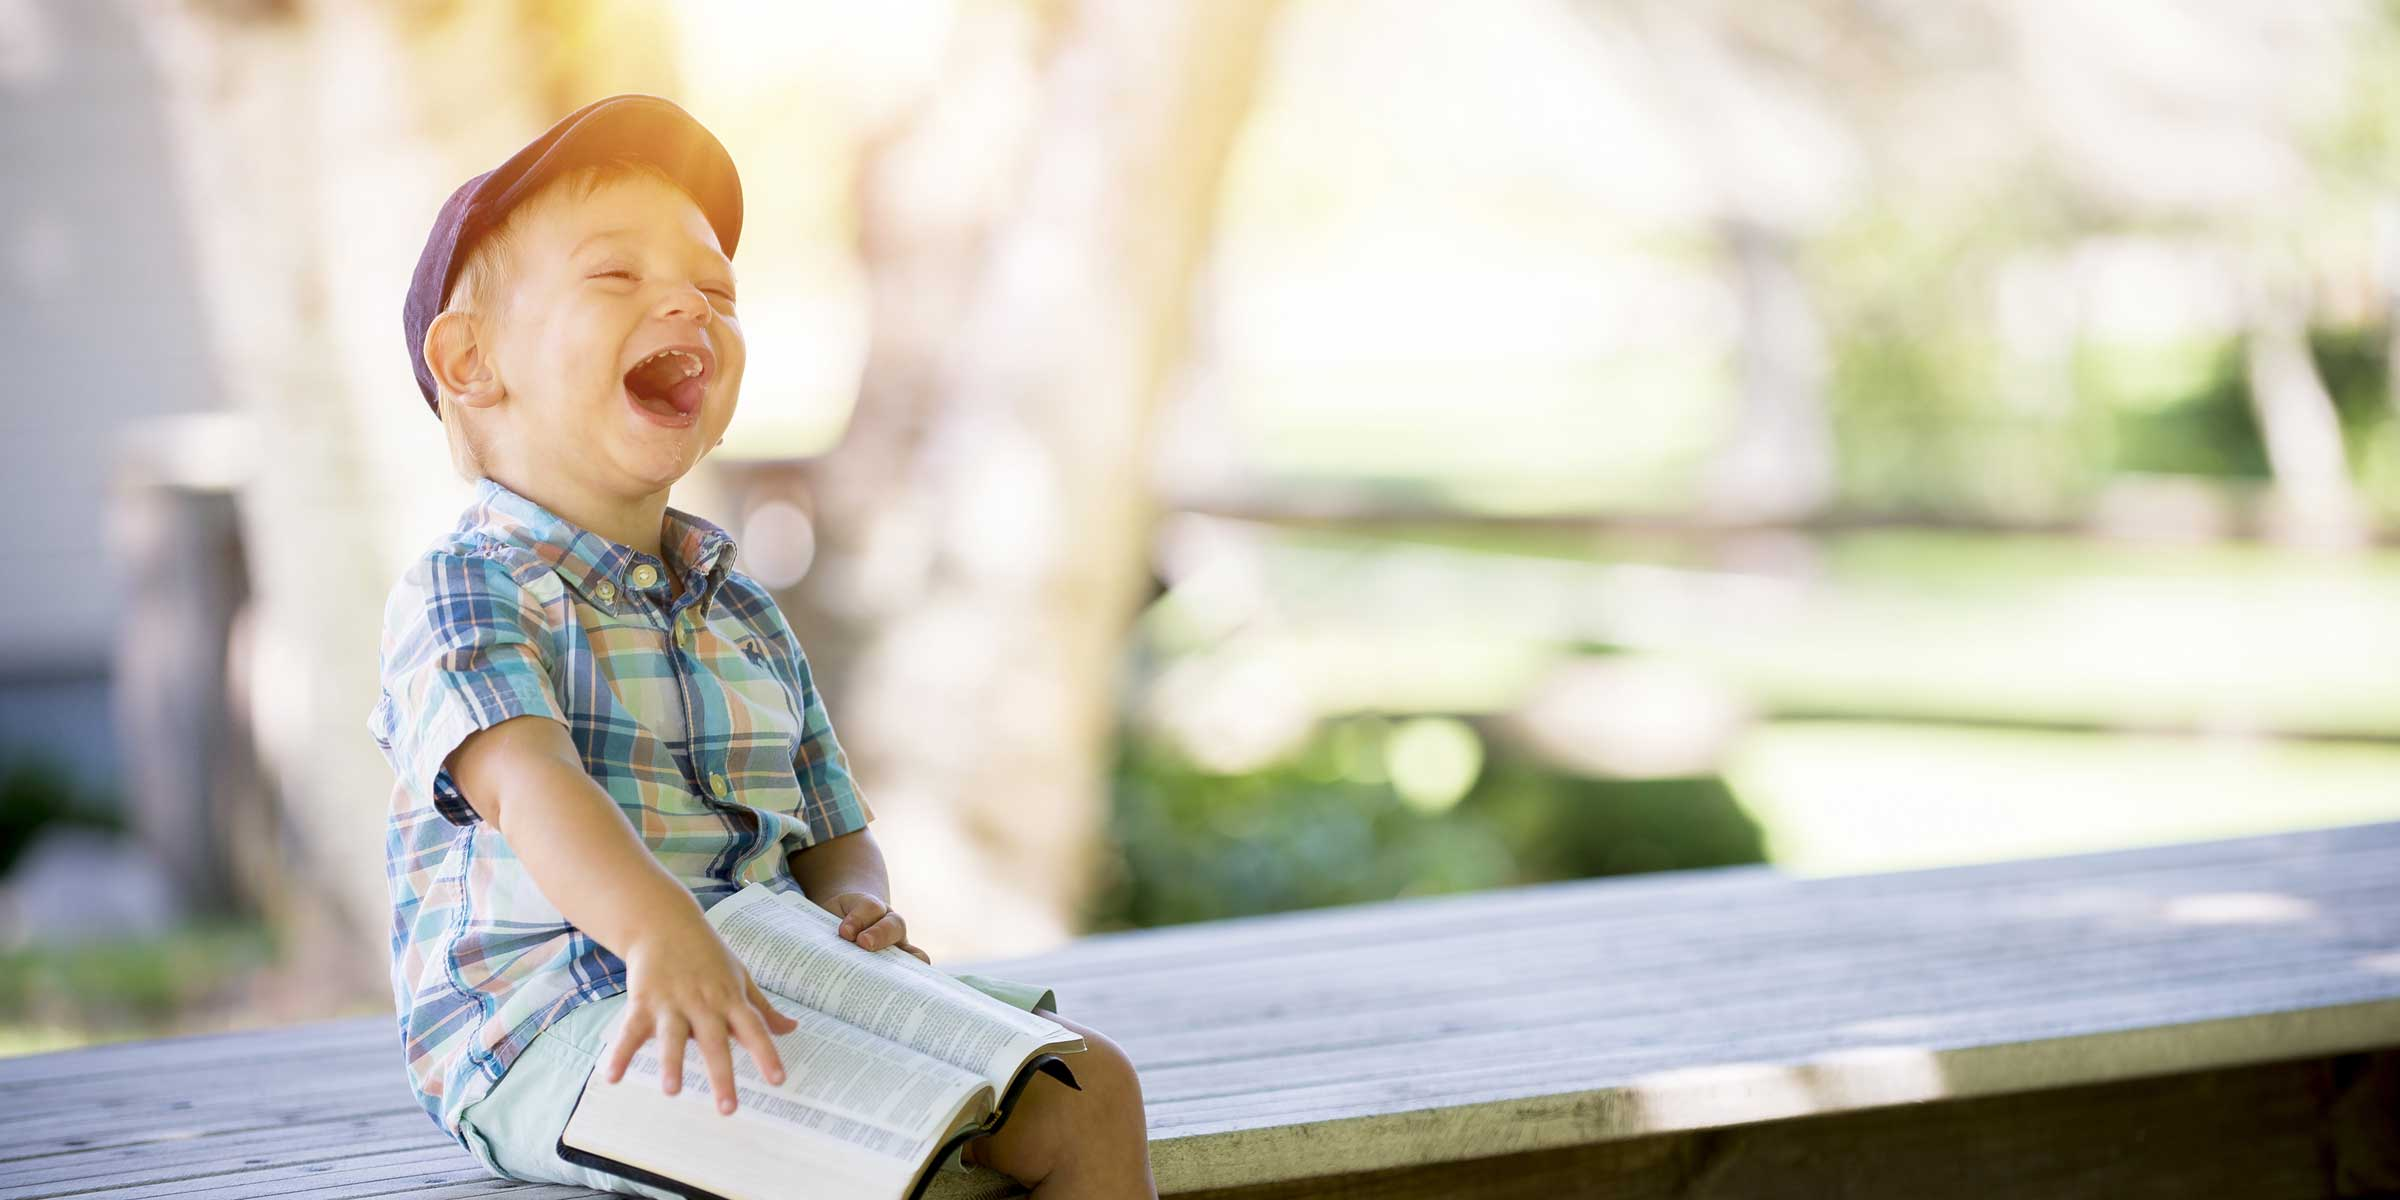 bambino con sindrome di Down sorridente